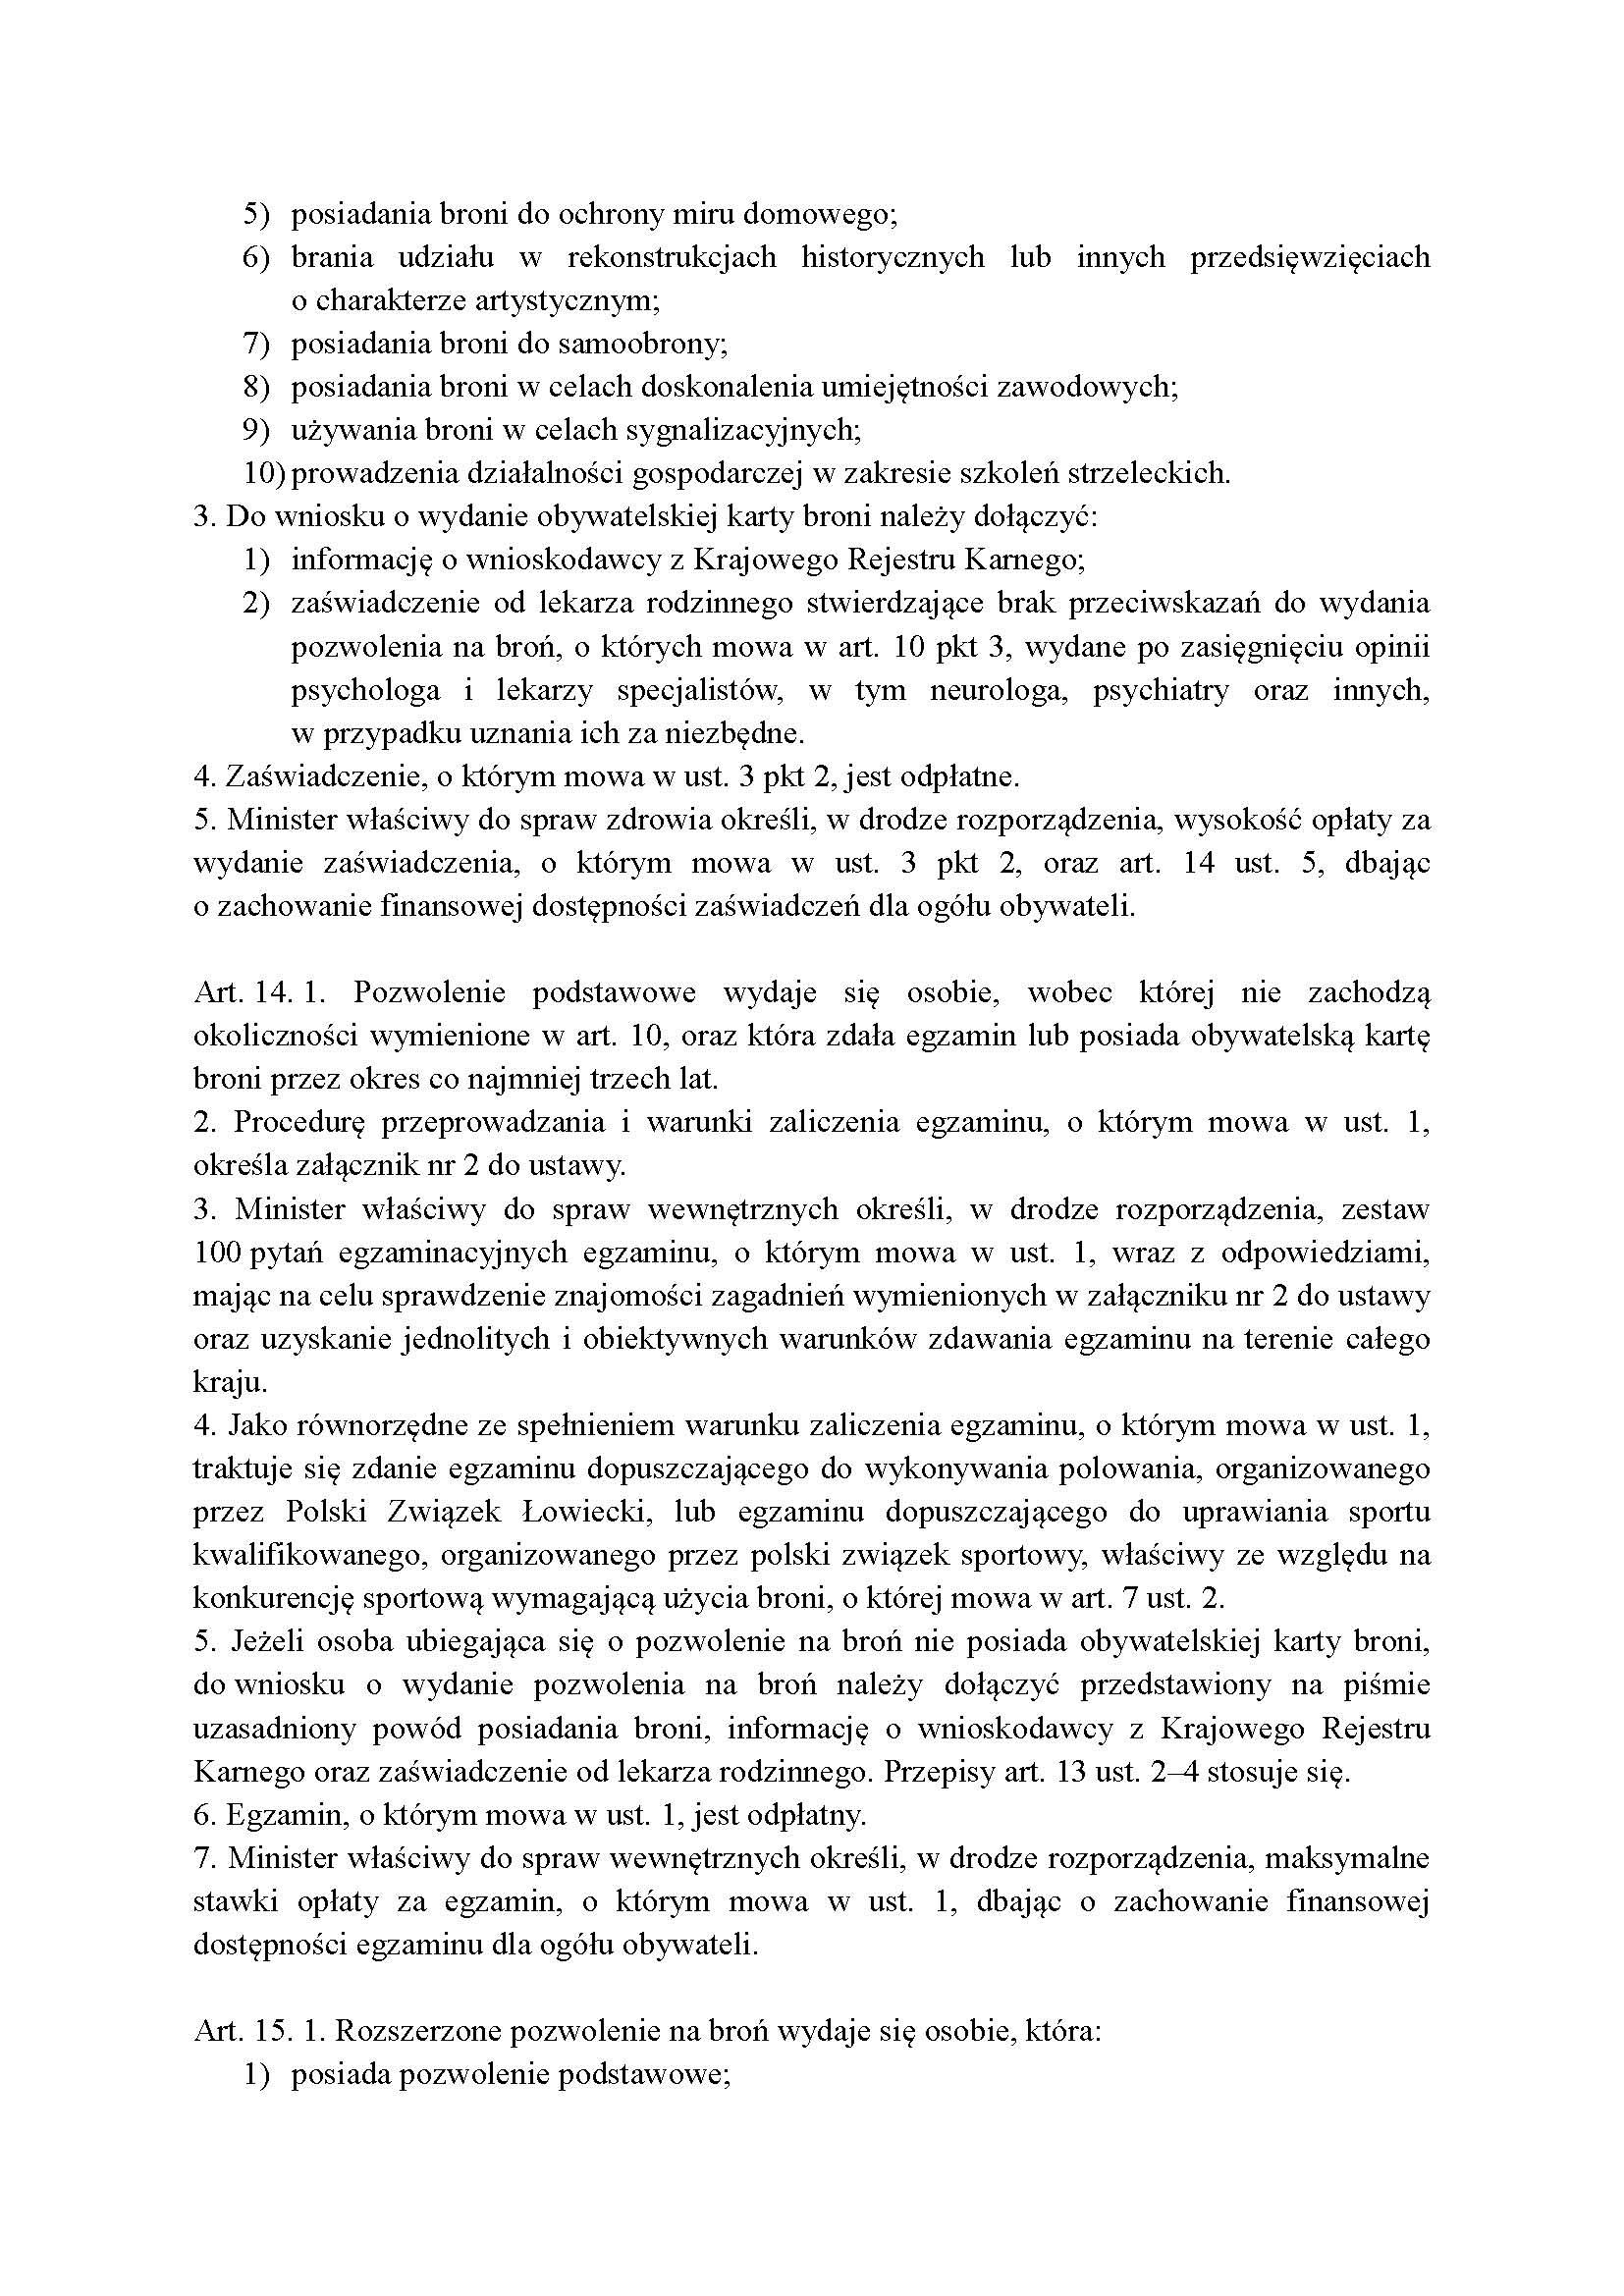 FRSwP_projekt_ustawy_20151125_Strona_08